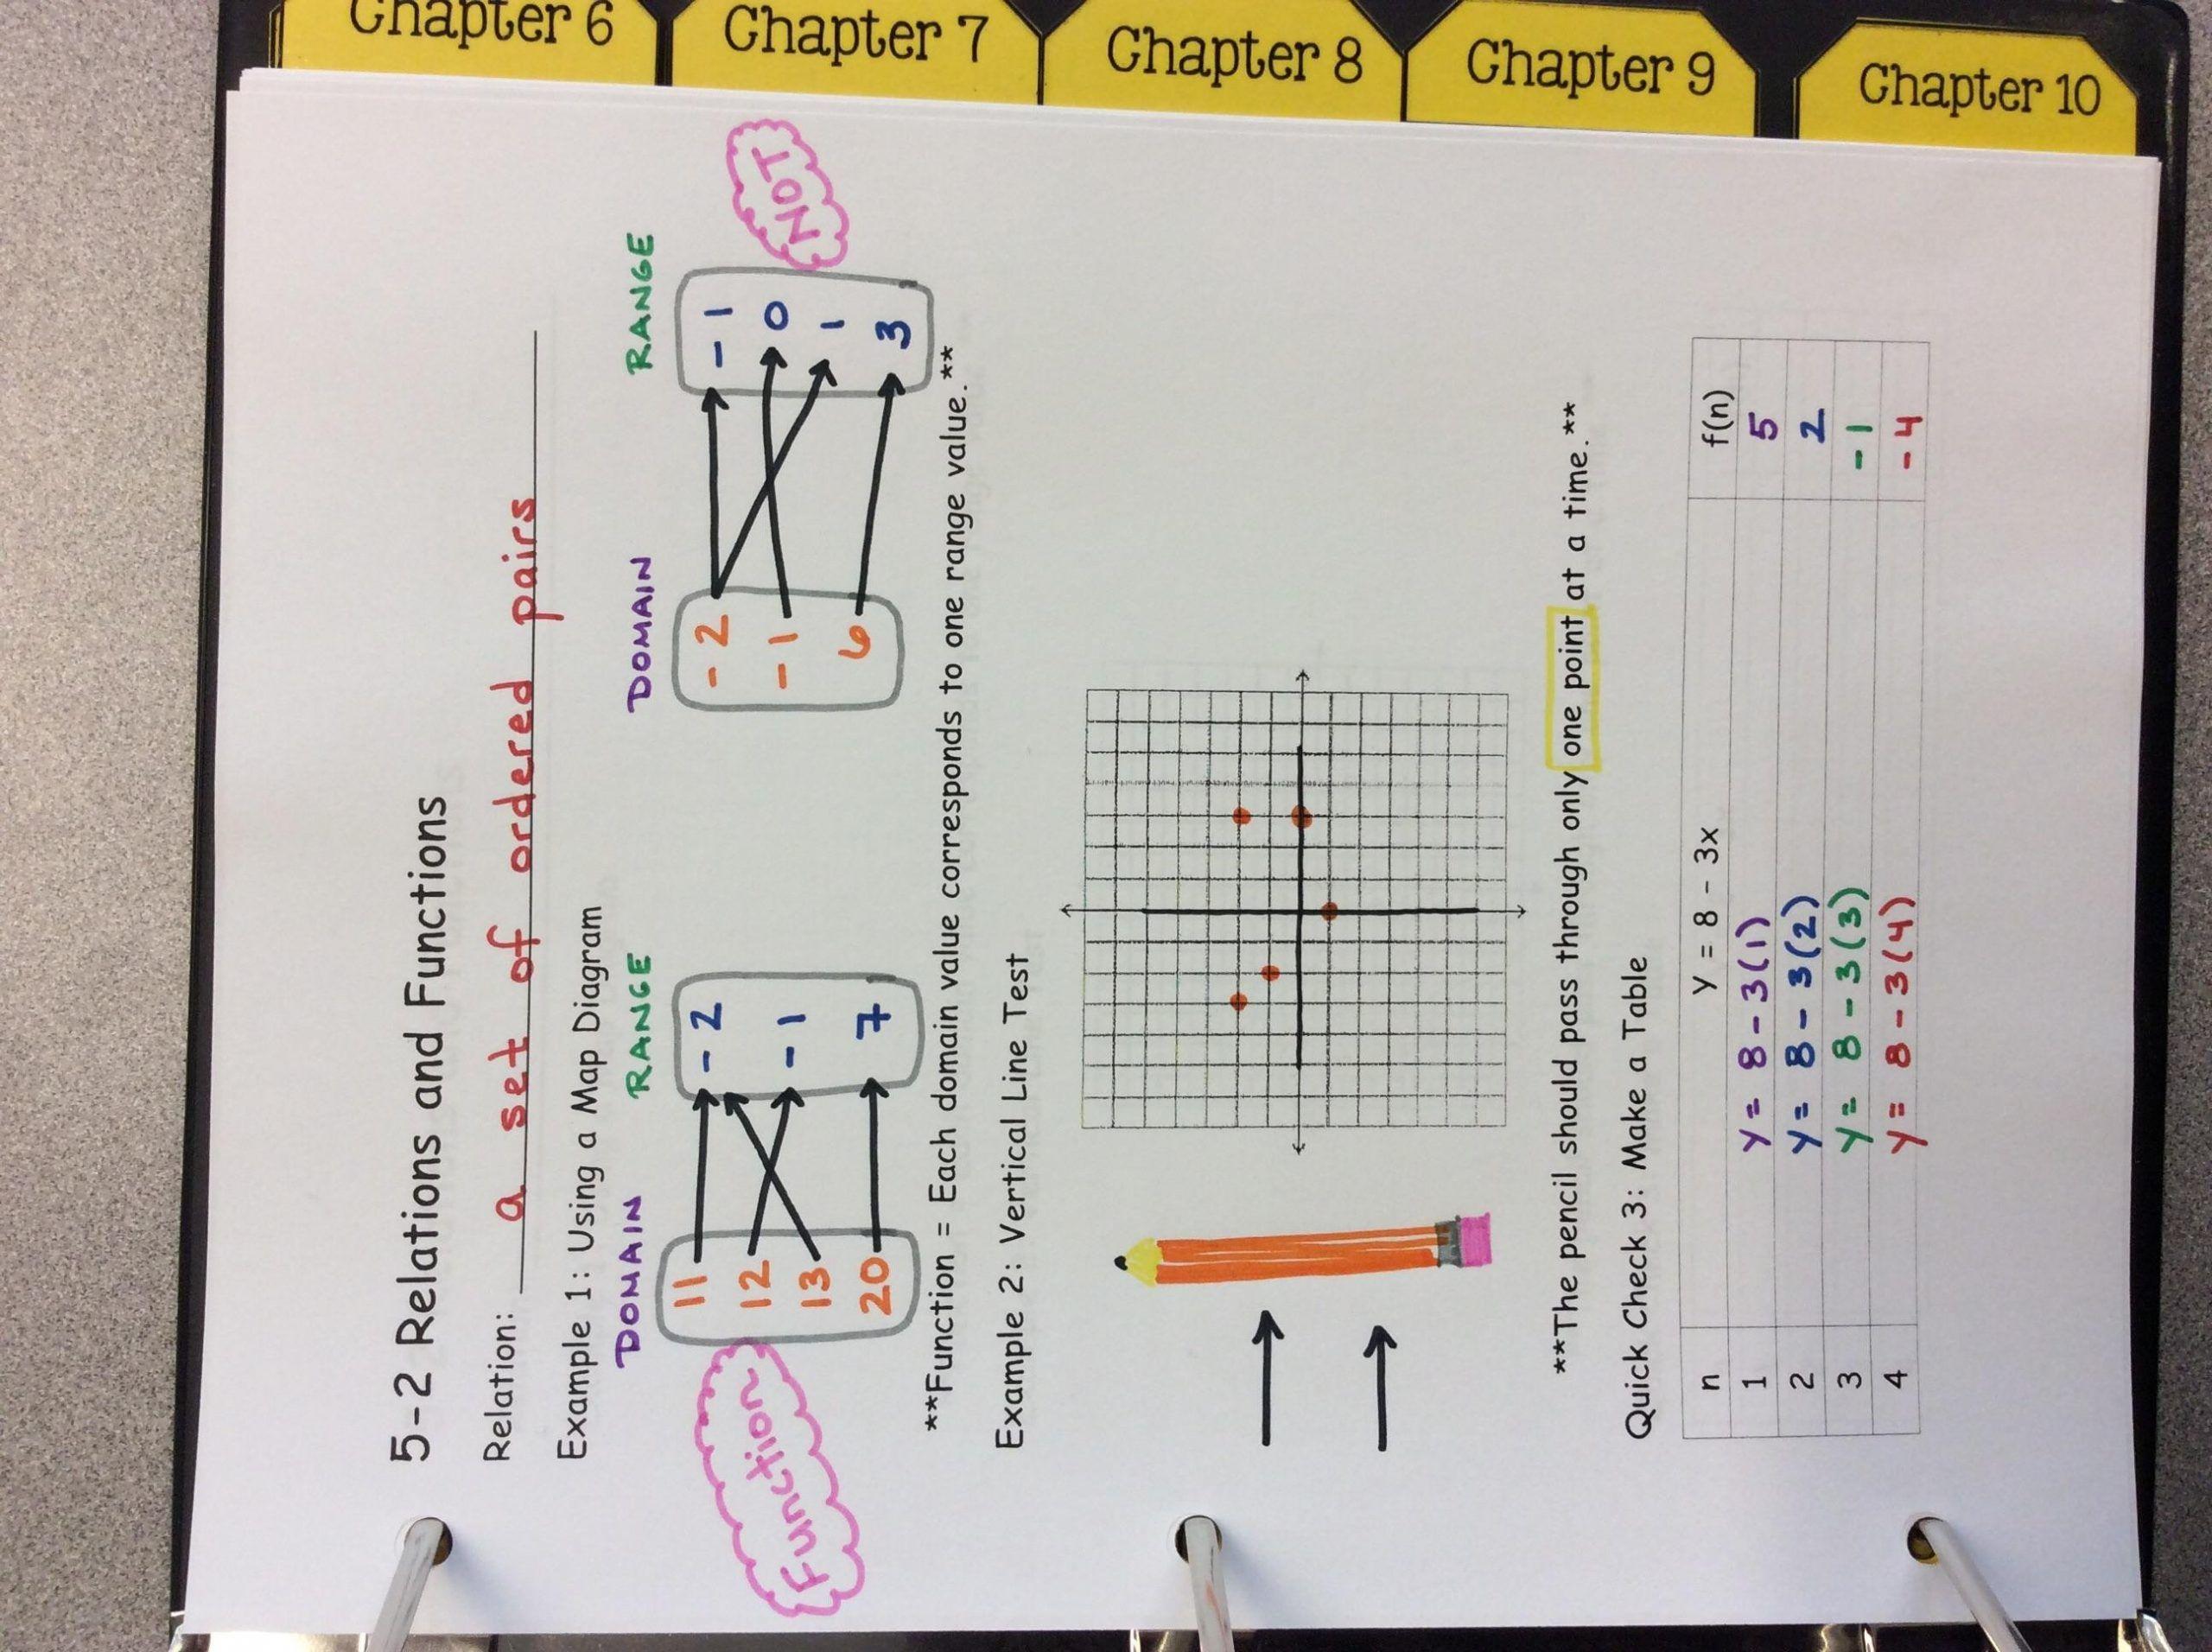 Vertical Line Test Worksheet Relations And Functions In 2020 Kids Worksheets Printables Word Problem Worksheets Cursive Writing Worksheets